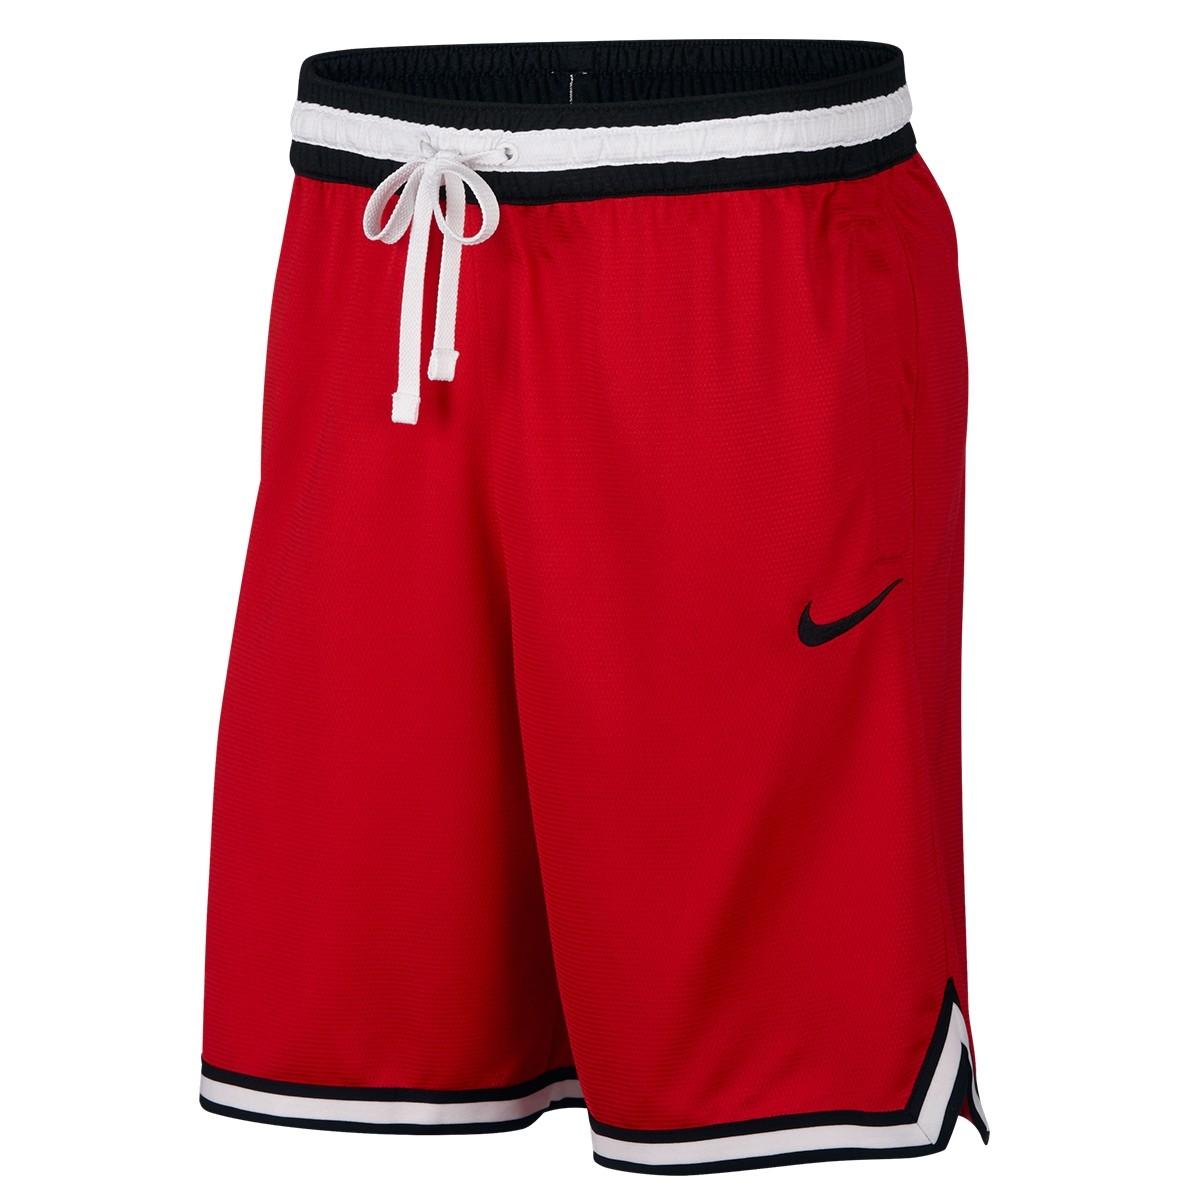 Nike Dri-FIT DNA 'Red'